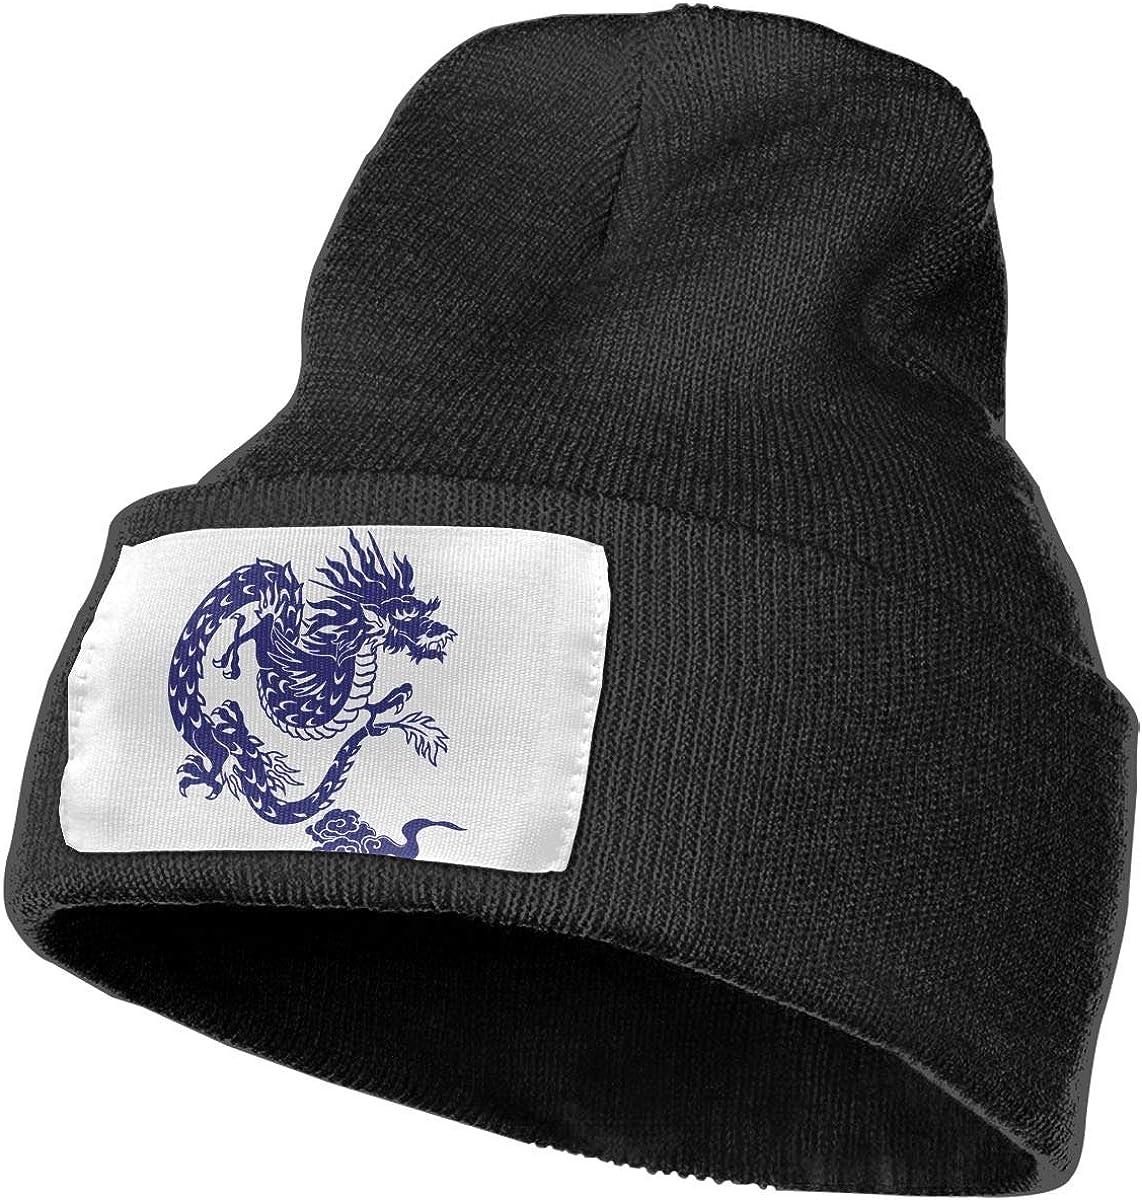 Japanese Dragon Unisex Fashion Knitted Hat Luxury Hip-Hop Cap